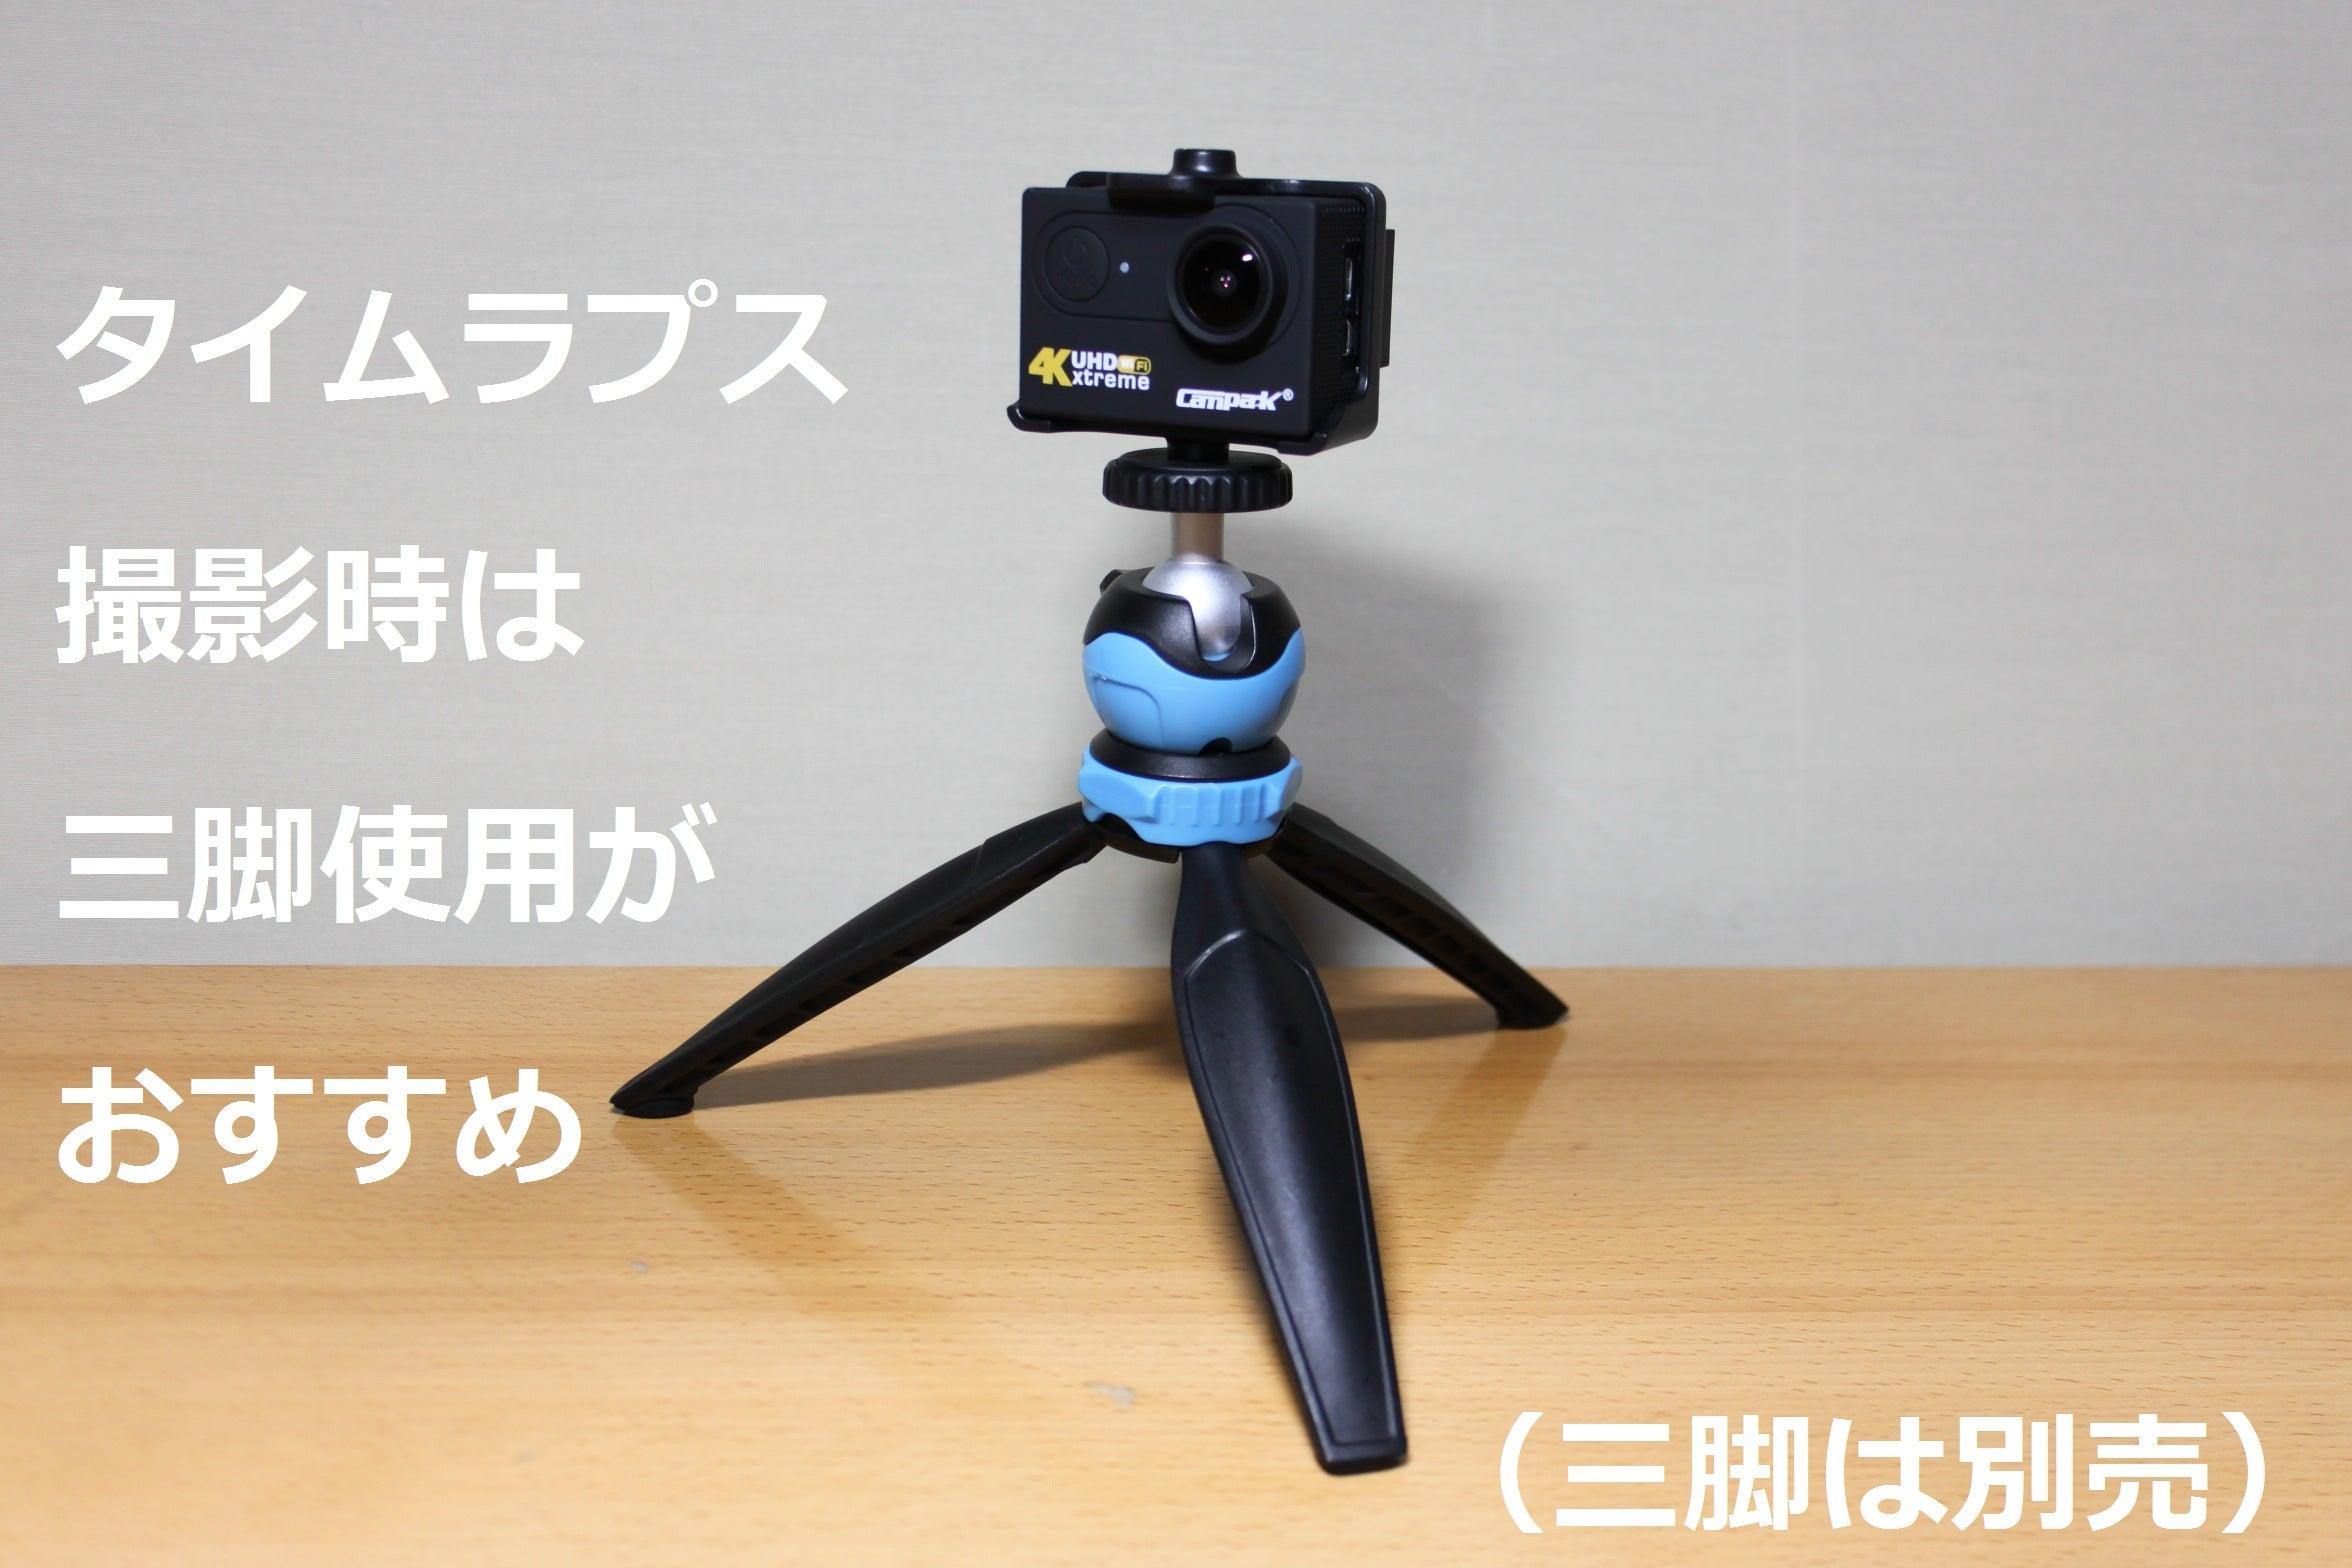 Campark® ACT73R 4K アクションカメラ オプション品も多数付属 | 家 ...